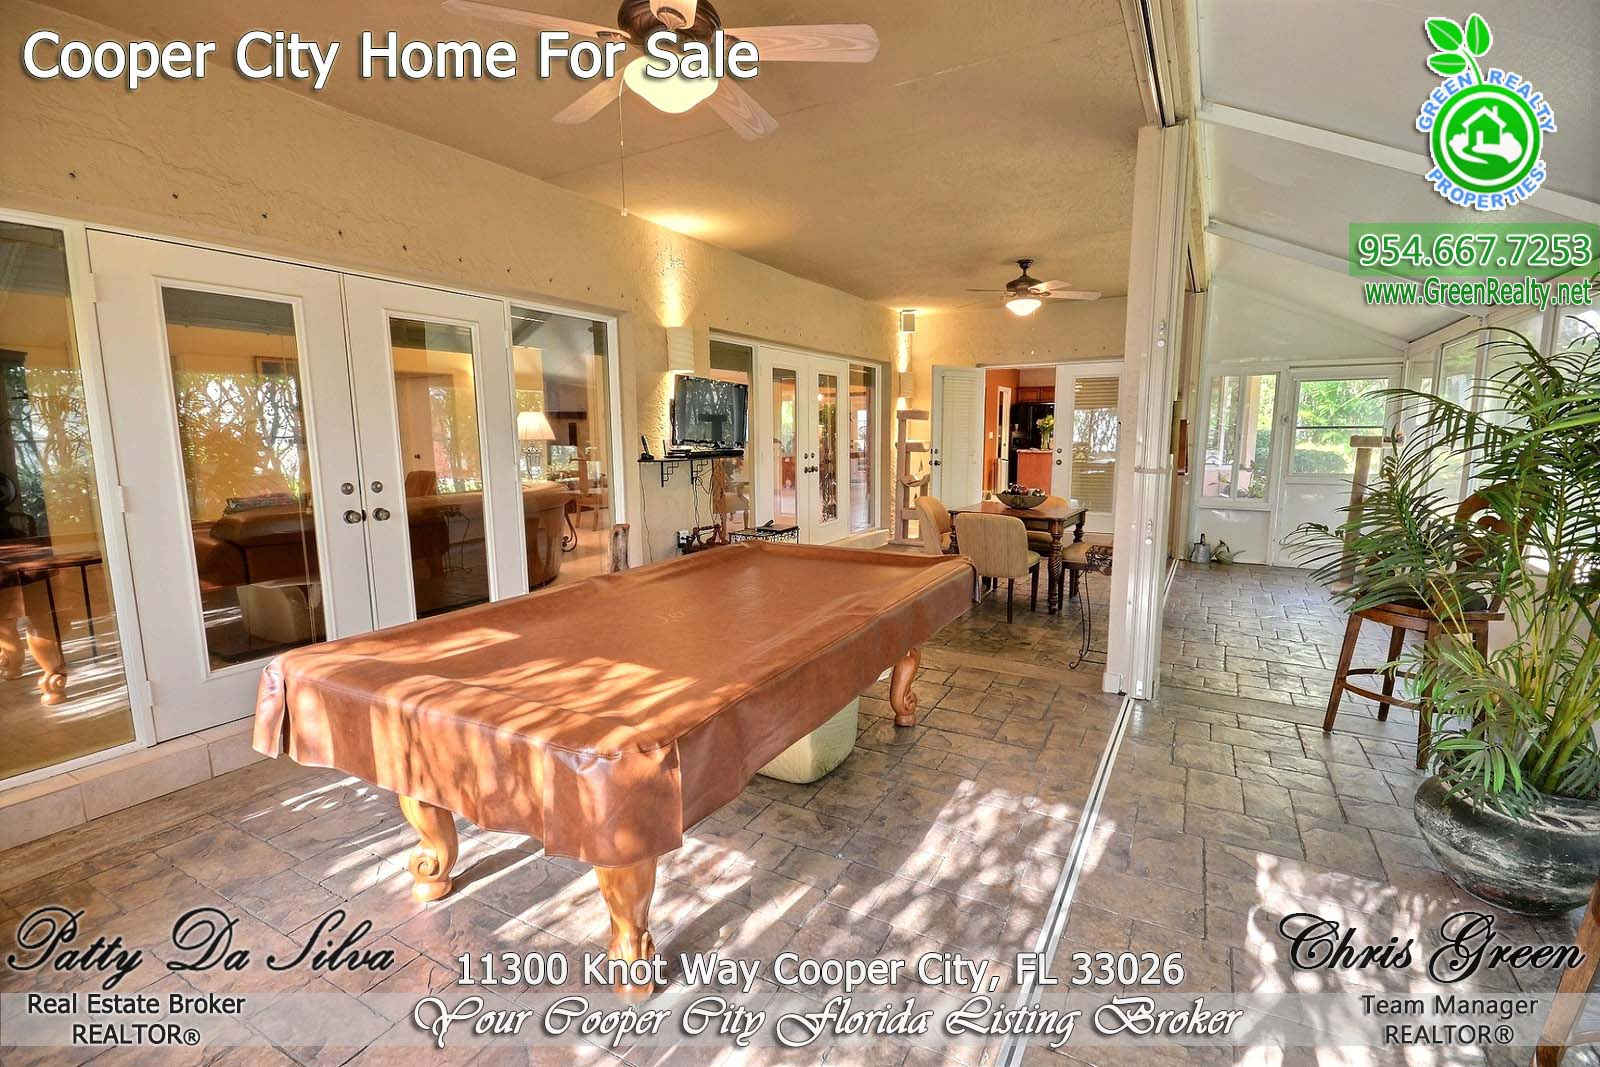 45 Rock Creek Cooper City Homes For Sale (3)